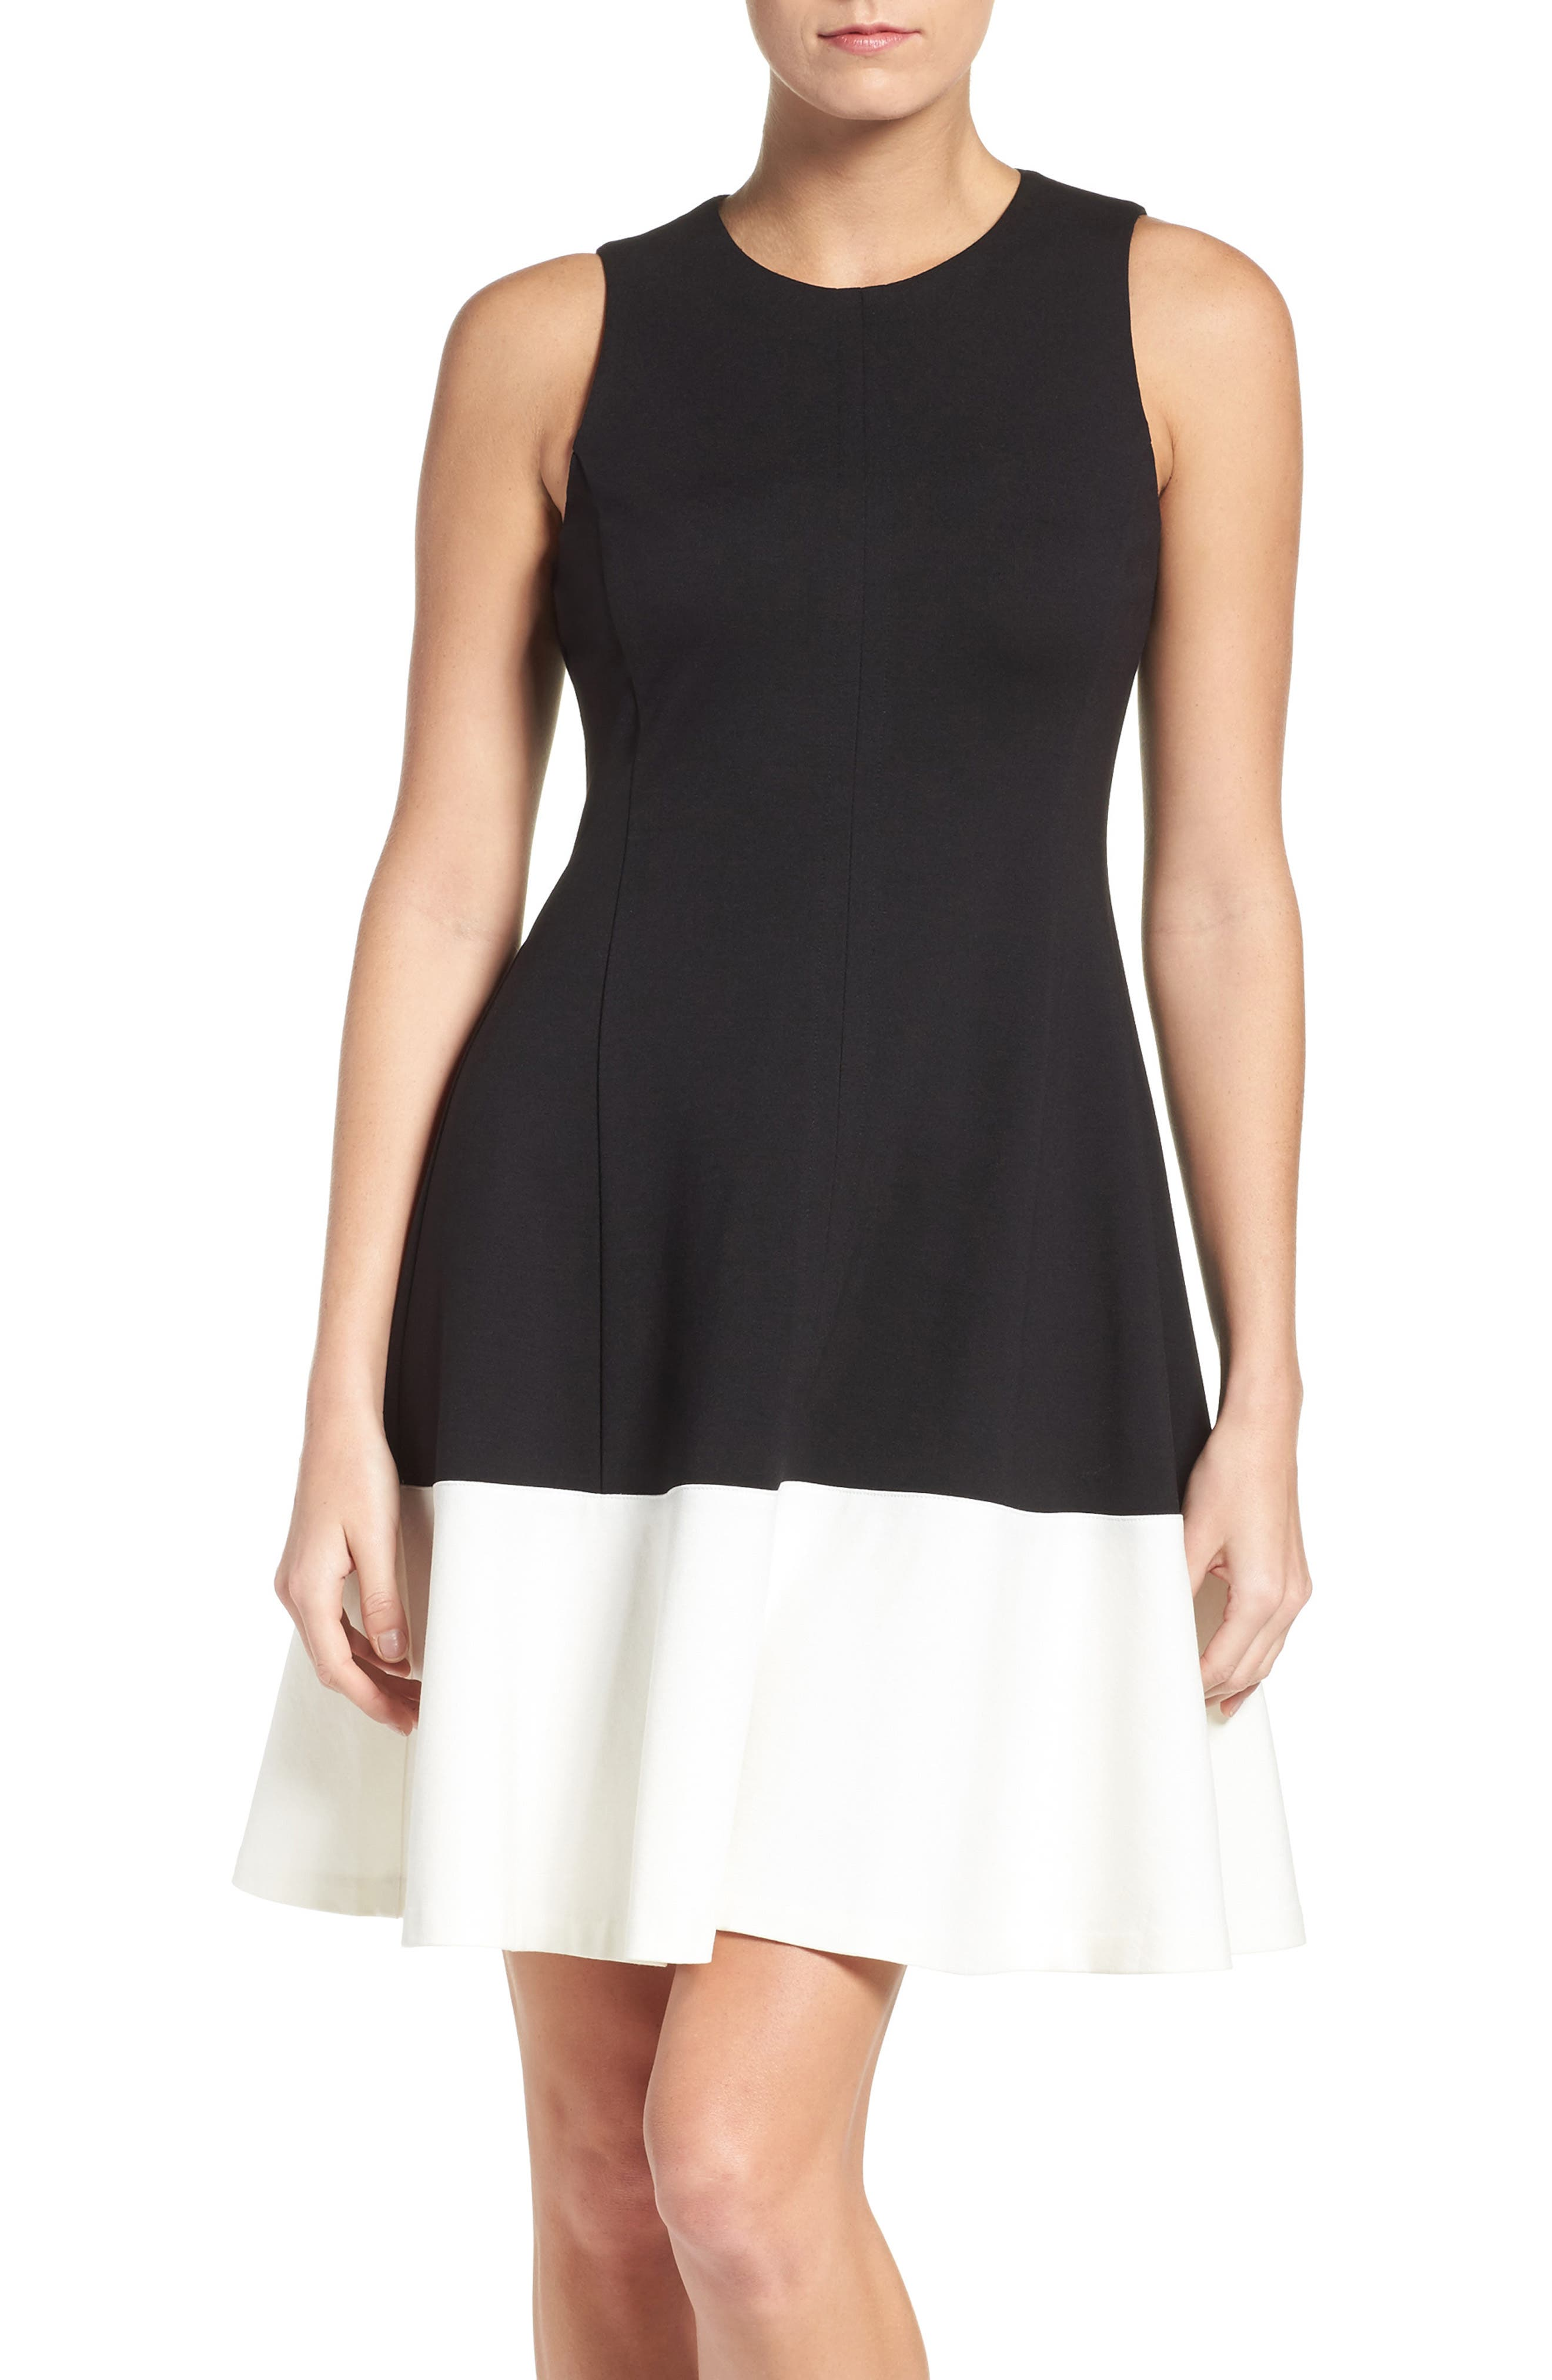 Alternate Image 1 Selected - Eliza J Colorblock Hem Fit & Flare Dress (Regular & Petite)